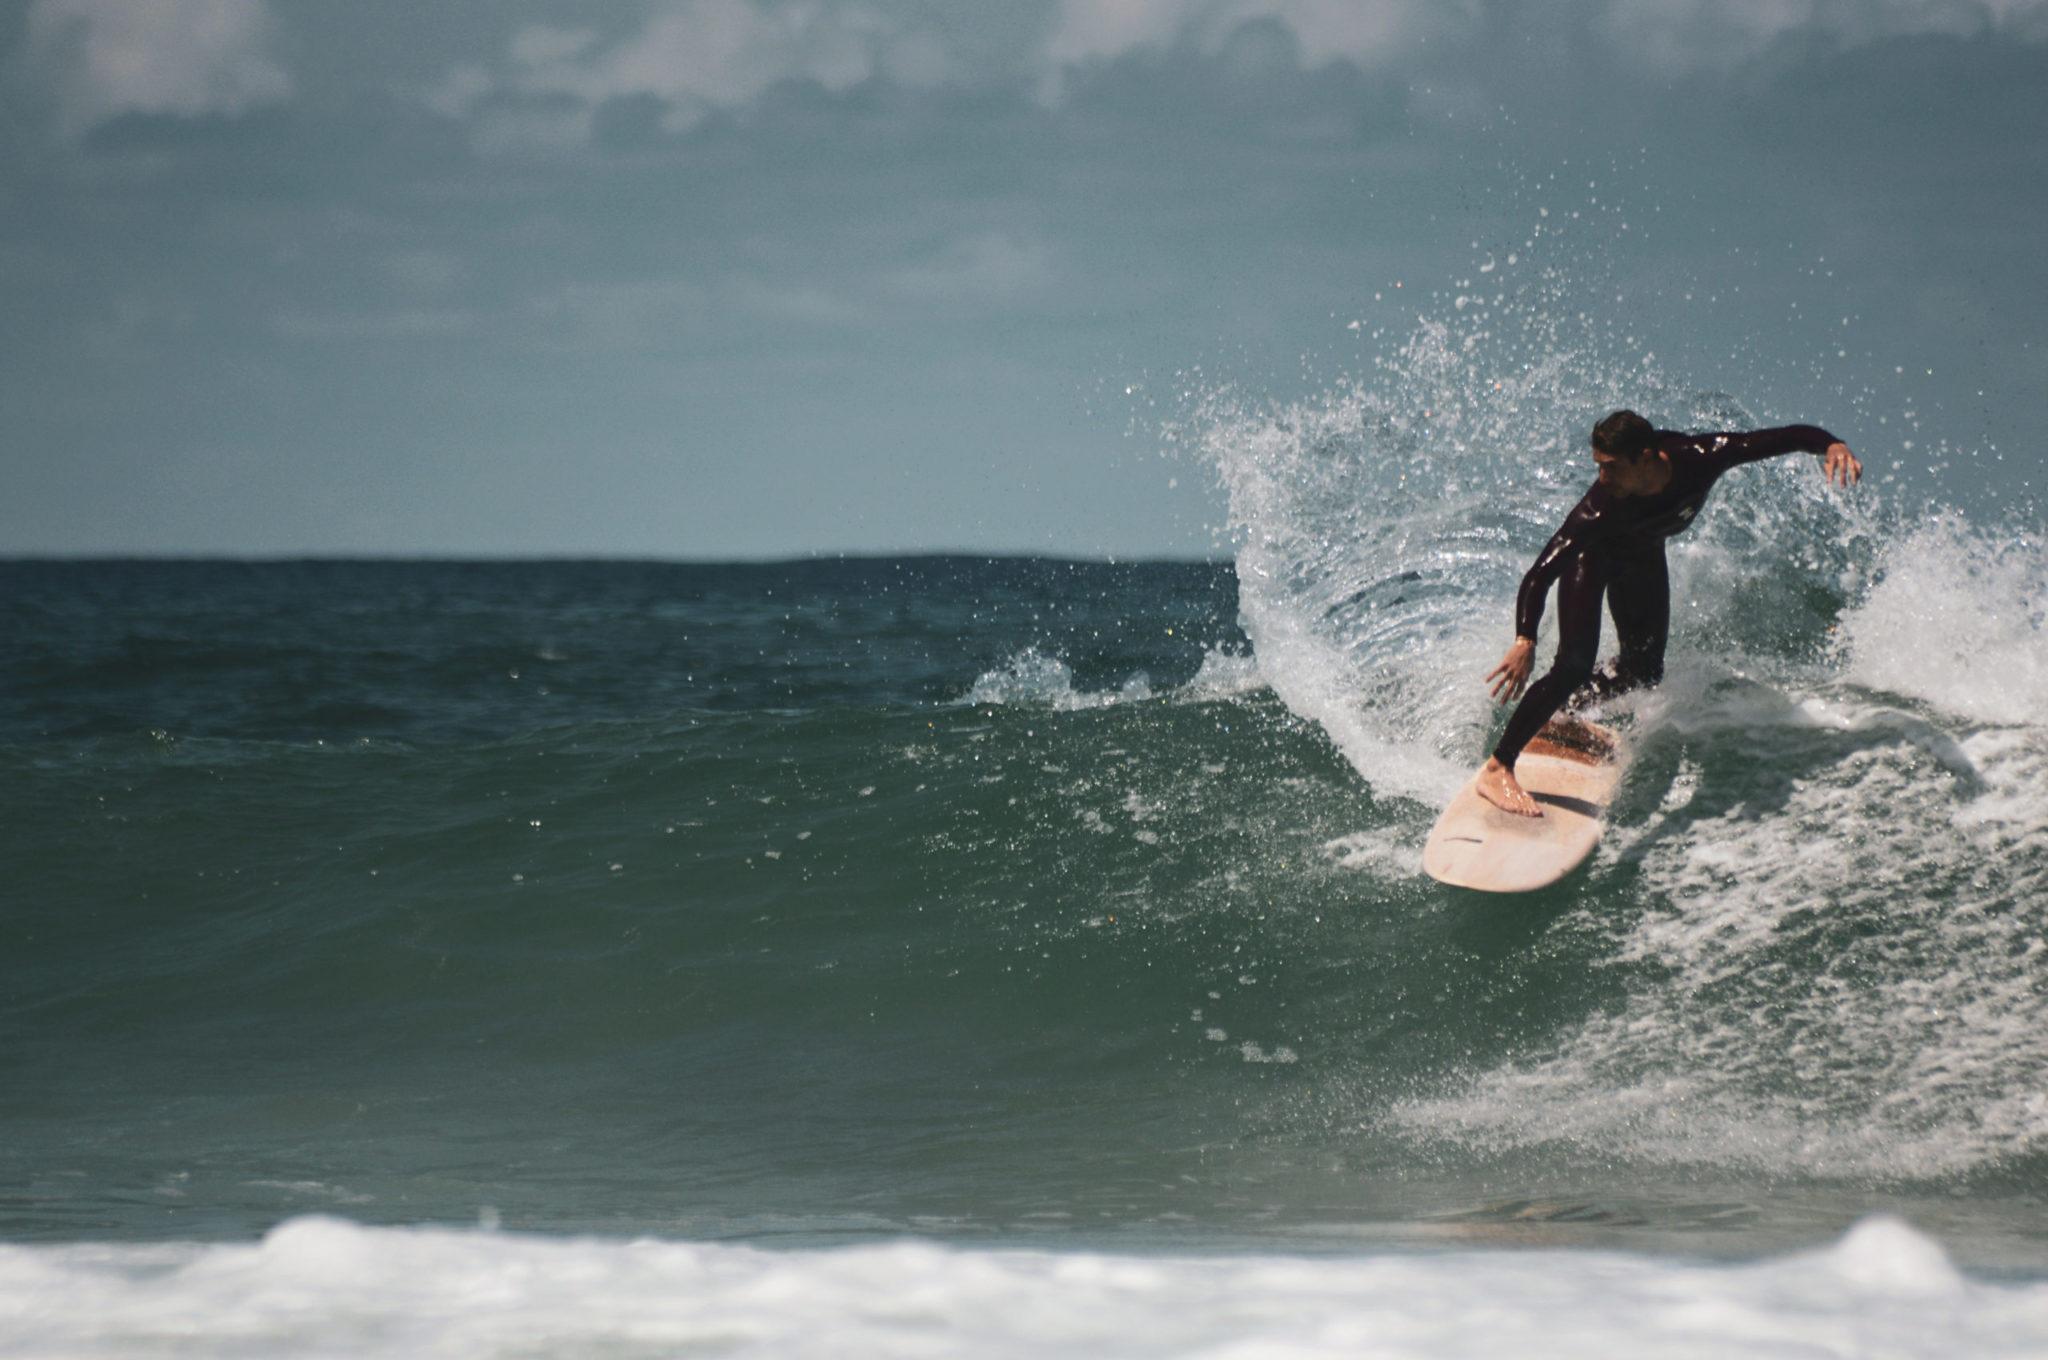 cachalot surfboards planche surf handmade artisan shaper hollow bois merguez hugo marin